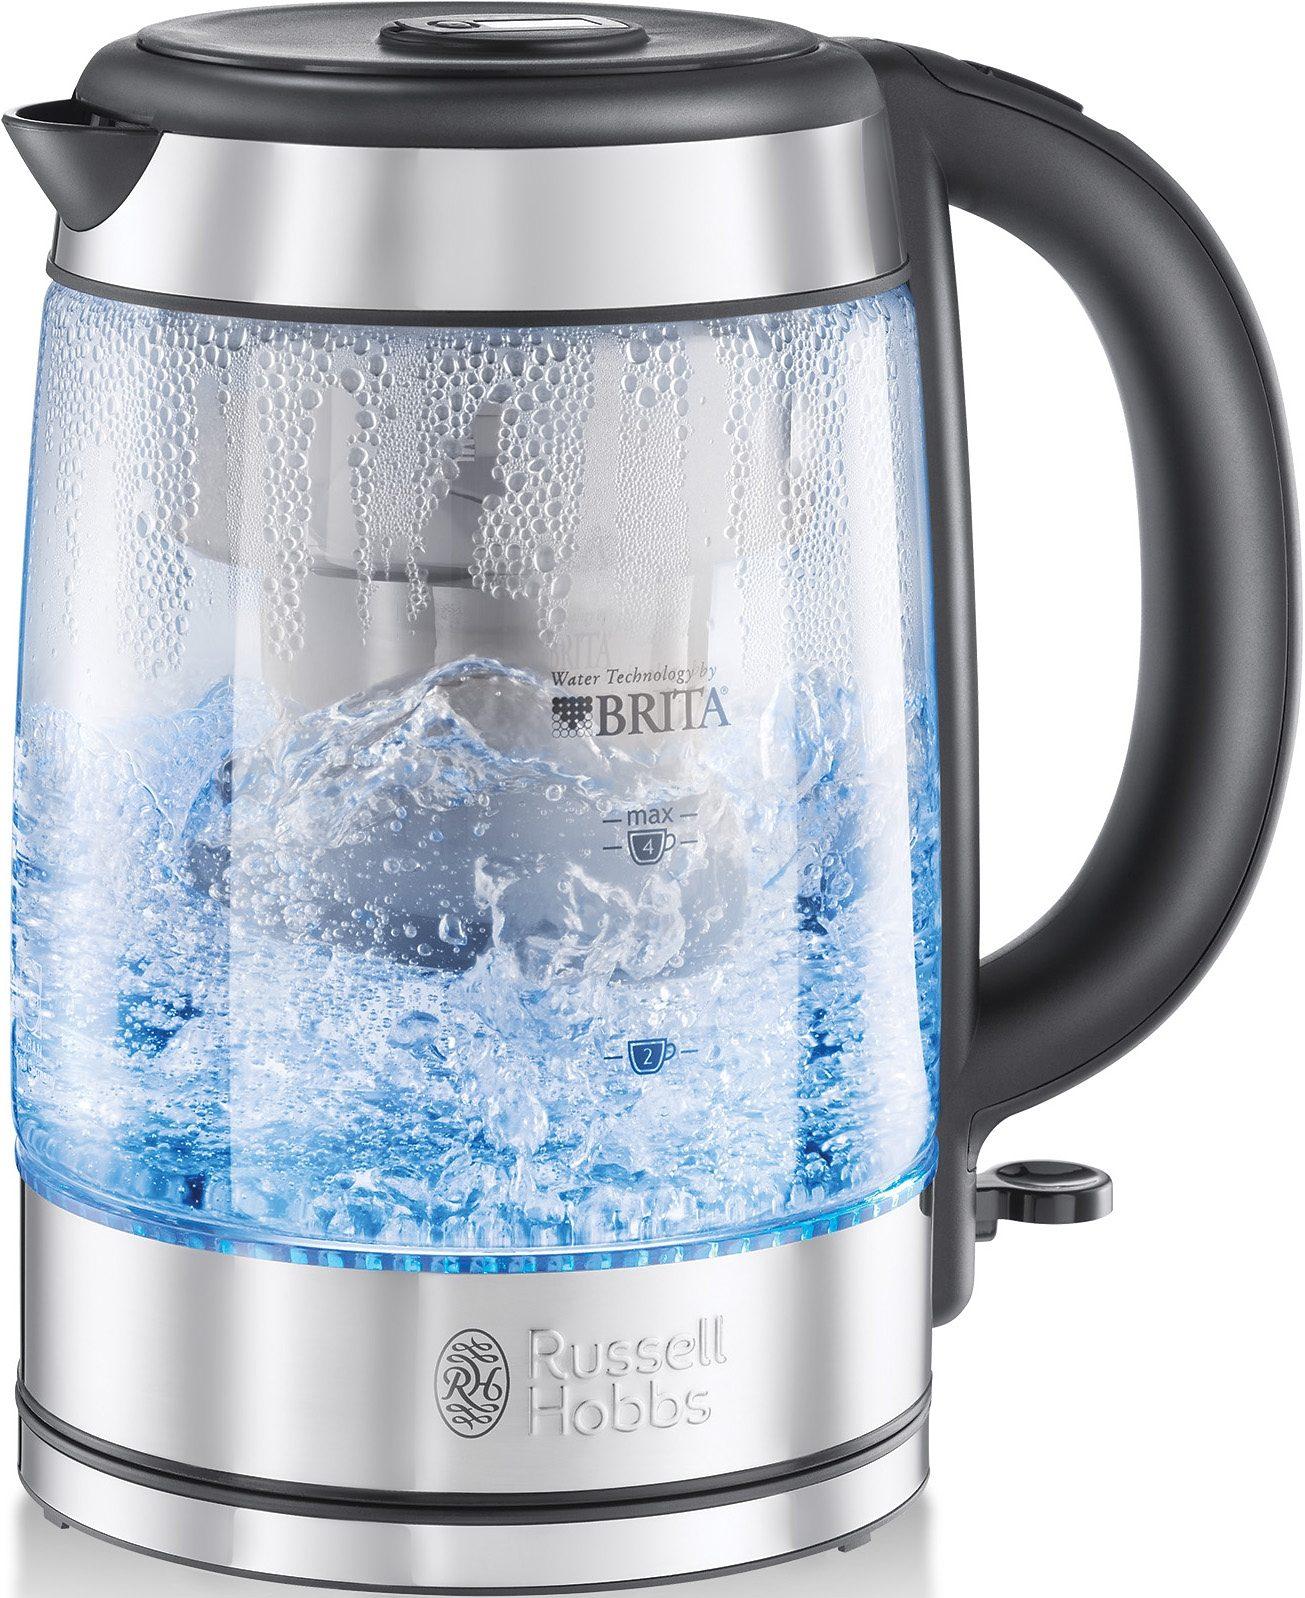 Russell Hobbs Glas-Wasserkocher Clarity, 1,5 Liter, 2200 Watt